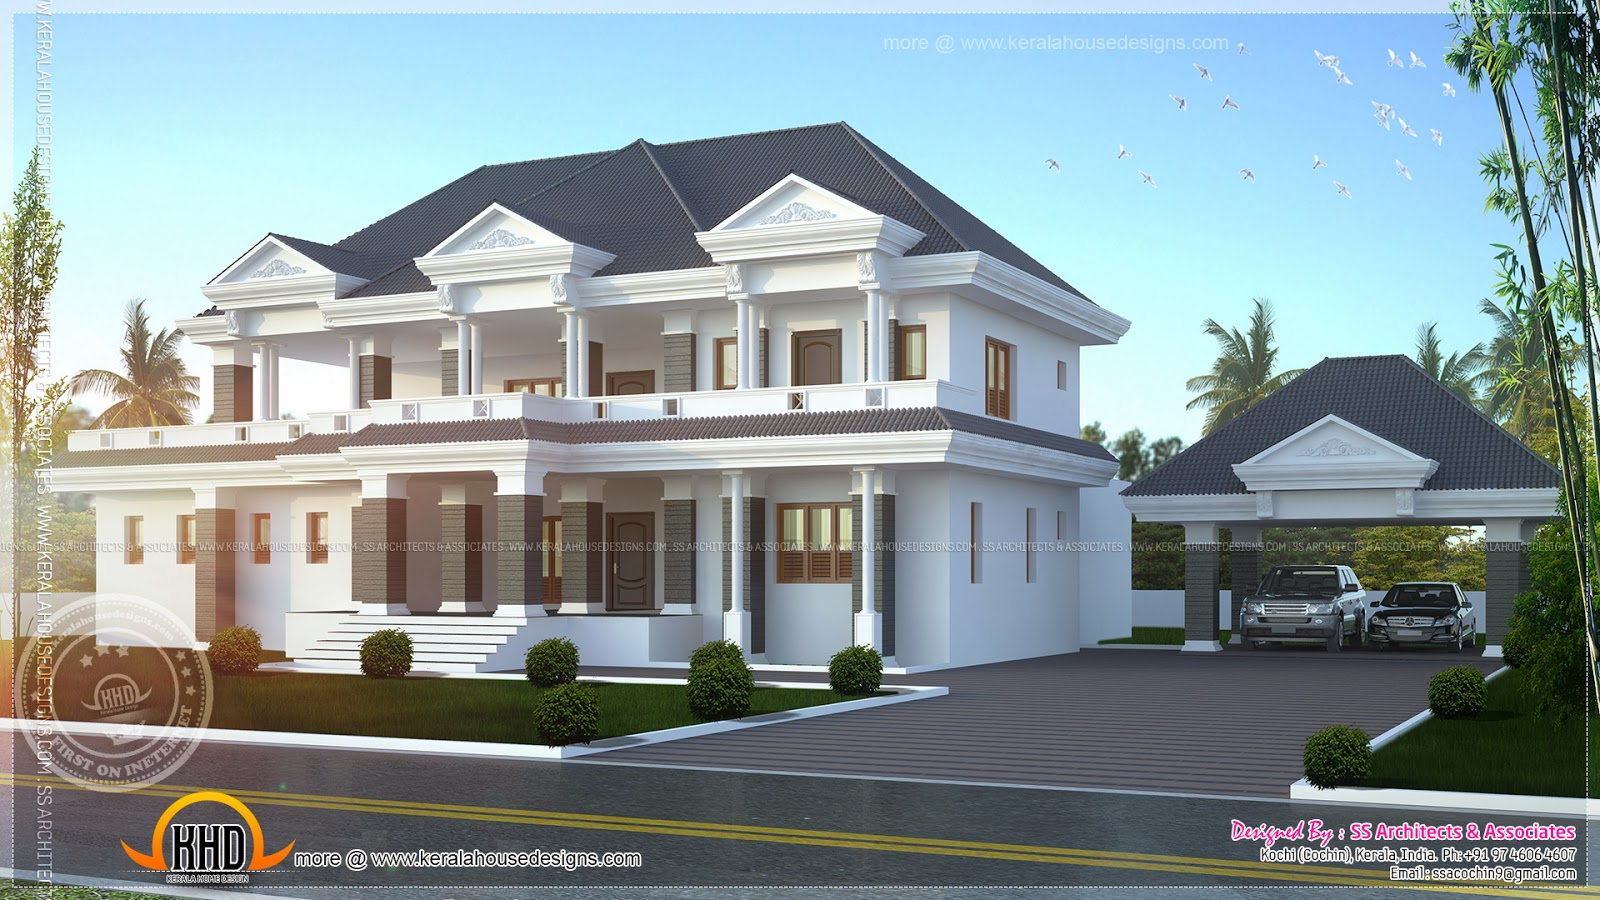 modern super luxury home design kerala home design floor plans luxury house plans luxury house plans luxury house